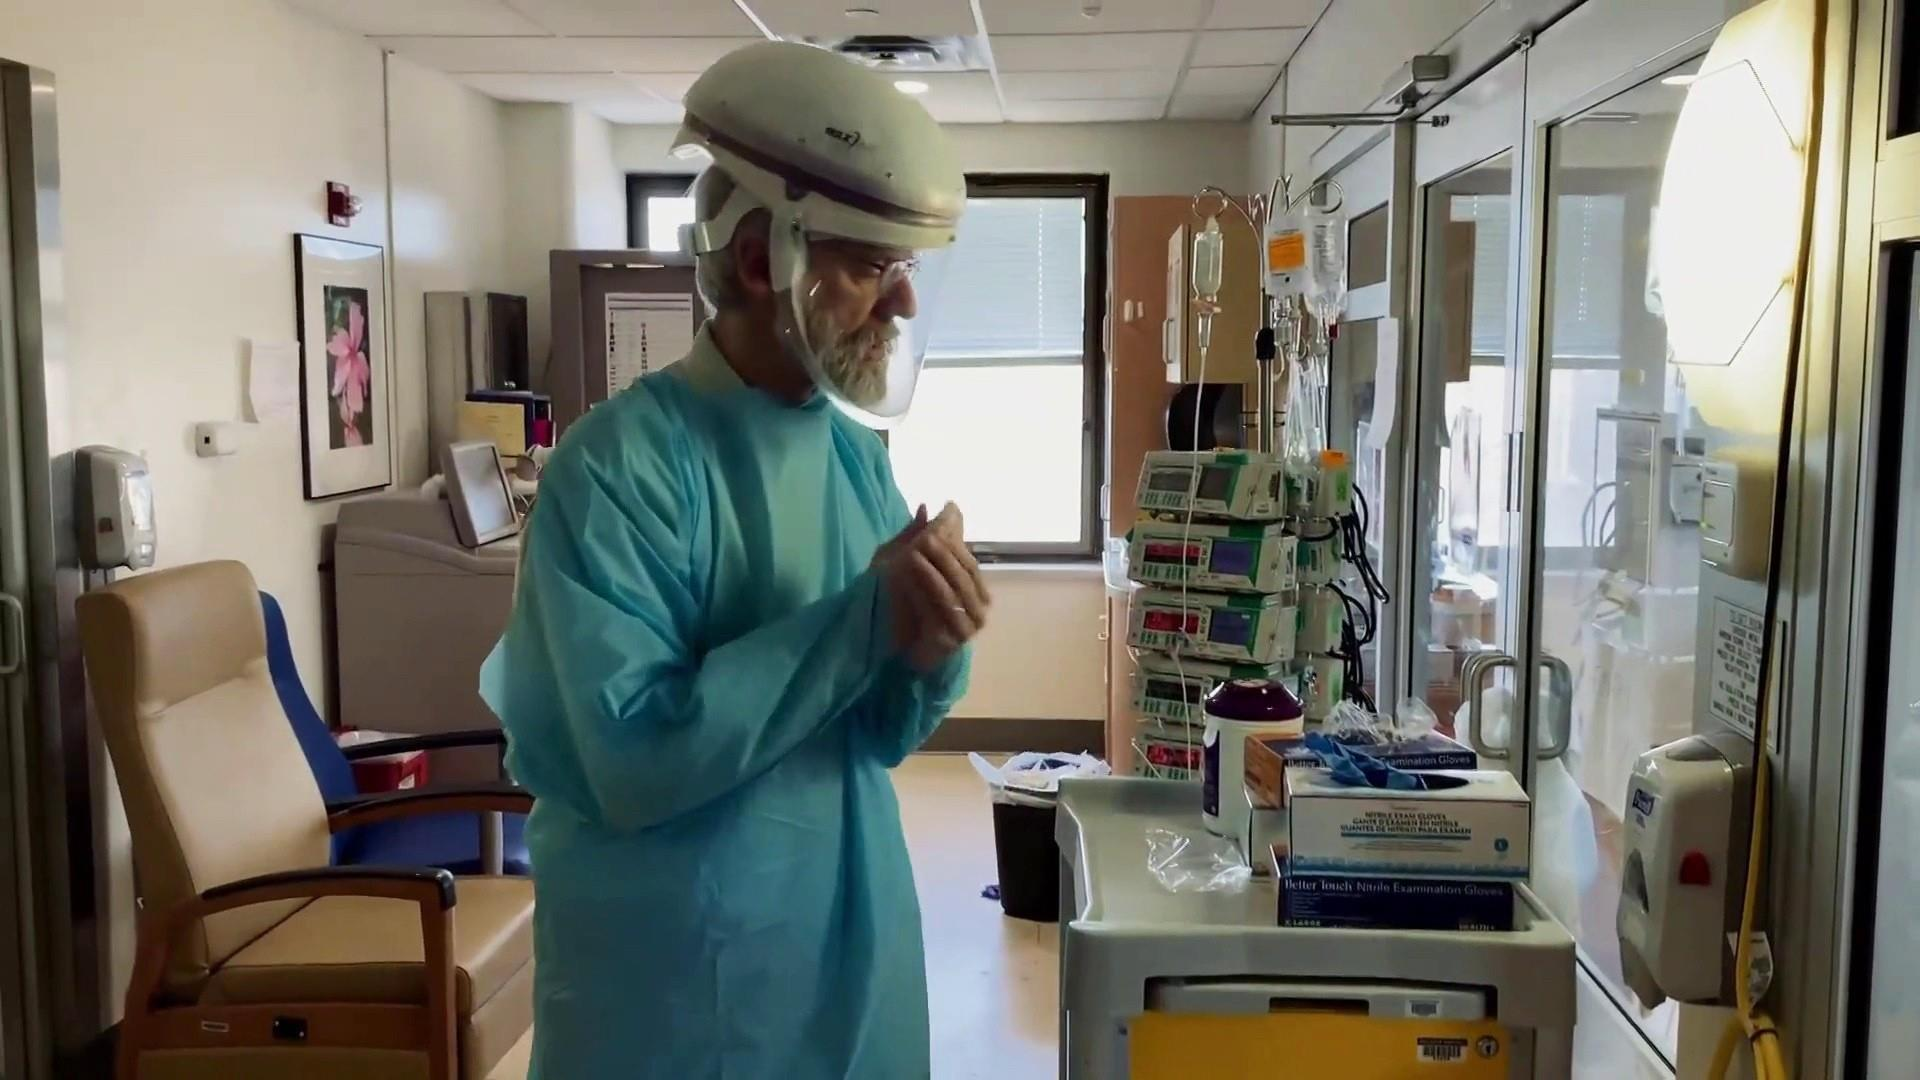 'A race to the finish line:' Inside Bellevue Hospital's whirlwind coronavirus preparation